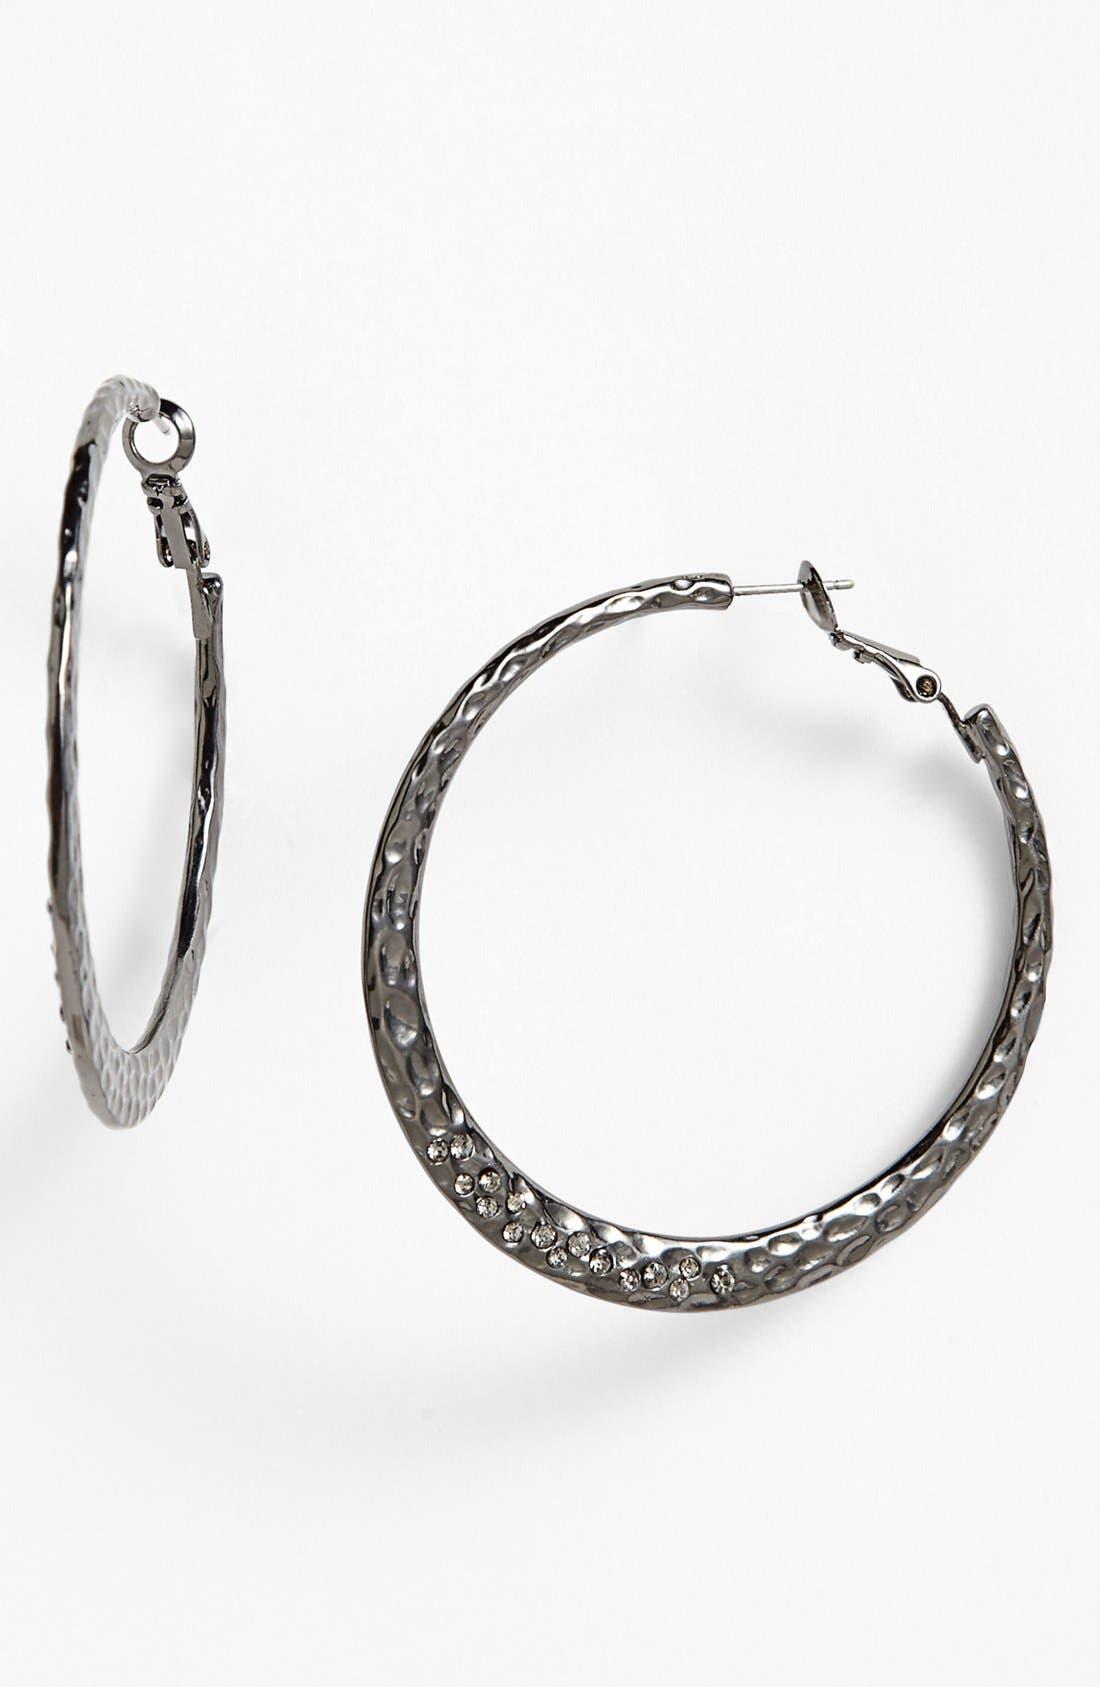 Alternate Image 1 Selected - Sequin Small Hammered Hoop Earrings